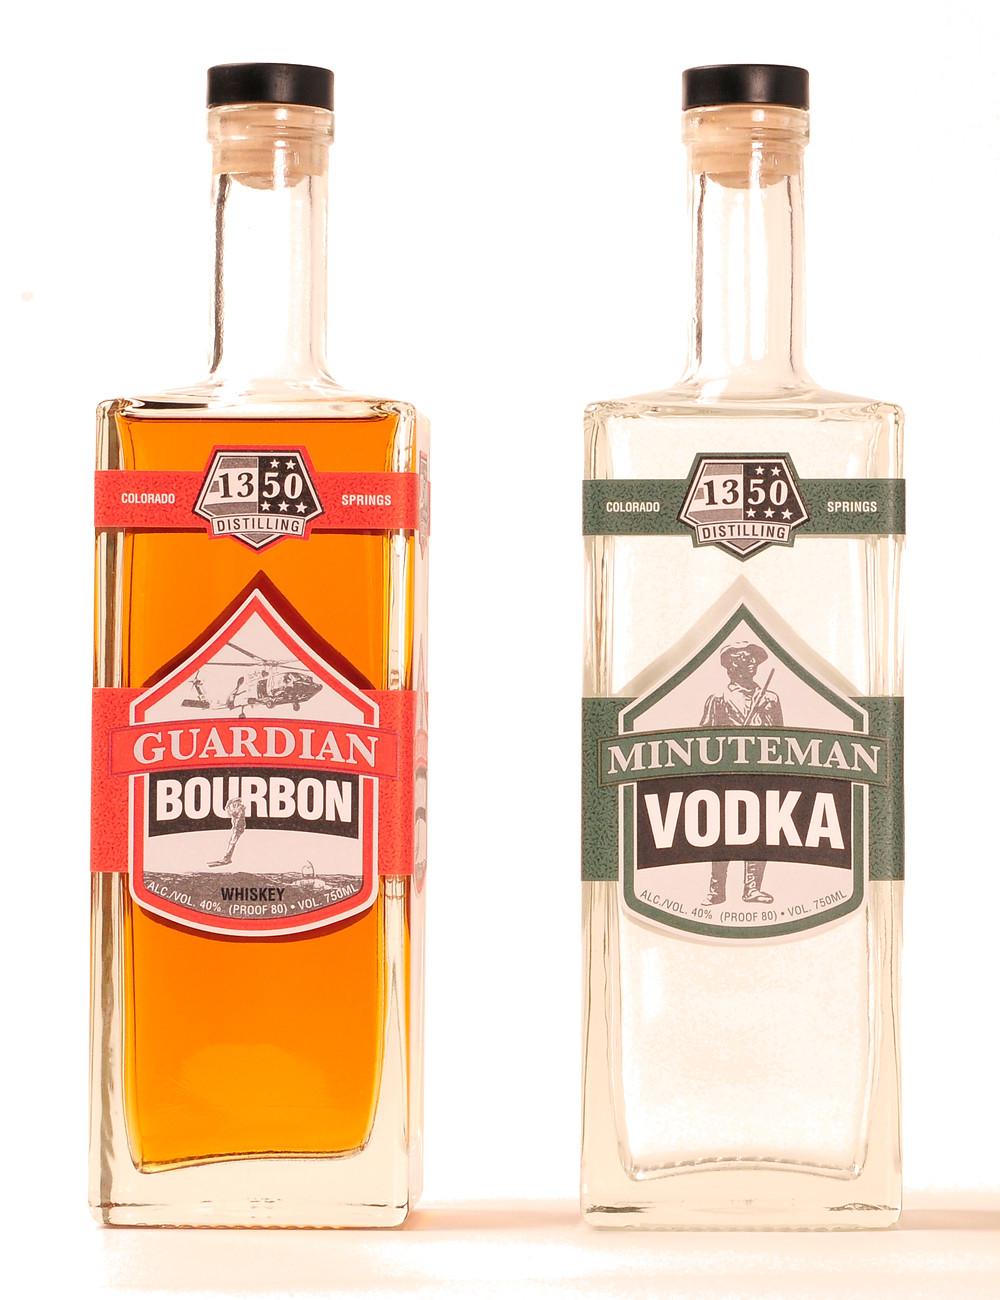 Guardian Bourbon and Minuteman Vodka for sale